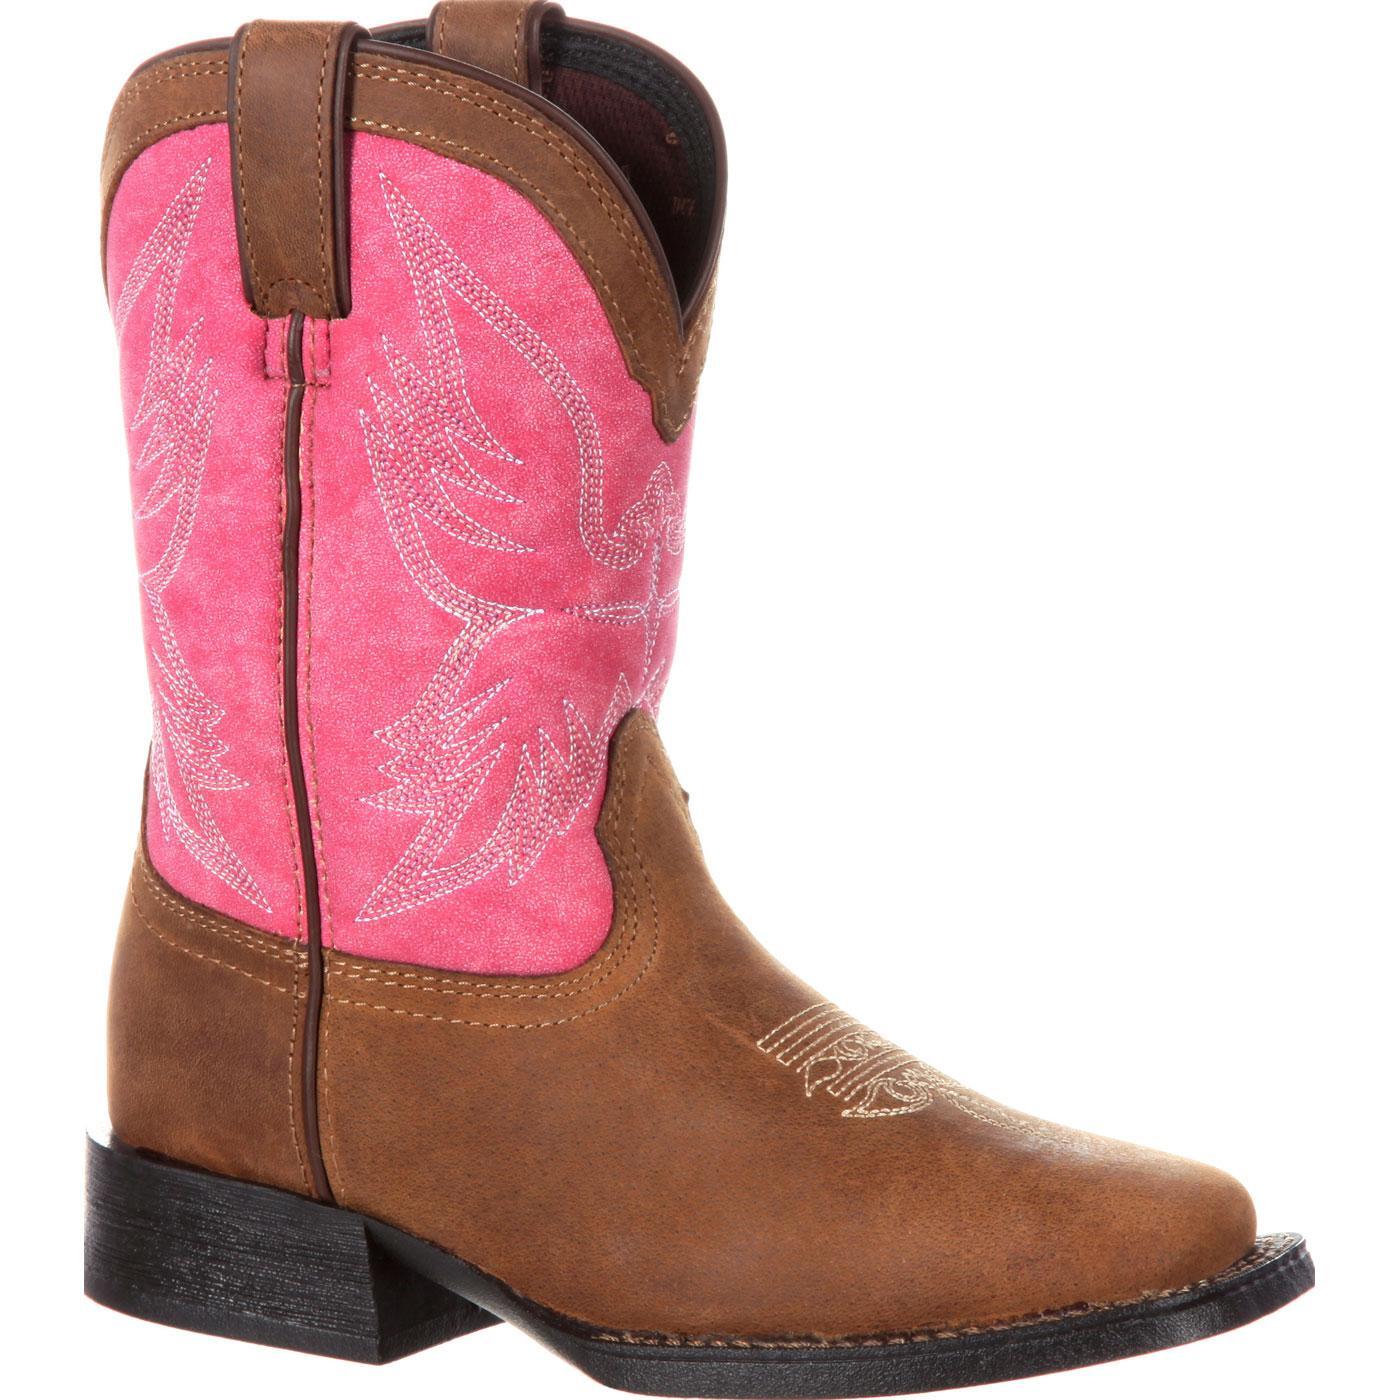 Durango Lil39 Mustang Big Kids39 Western Boot Dbt0168